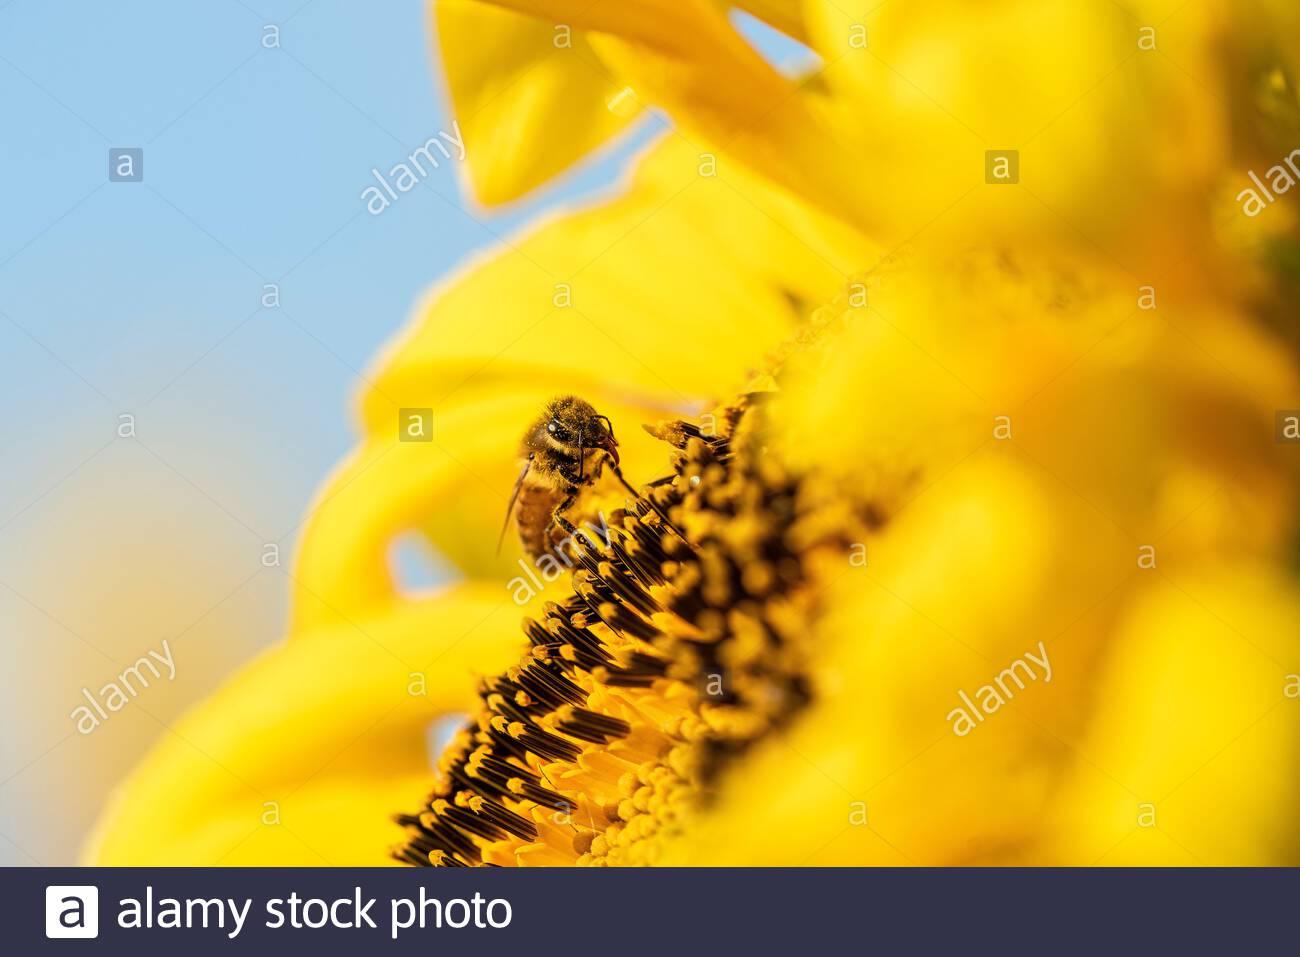 honey-bee-pollinating-an-organic-sunflow